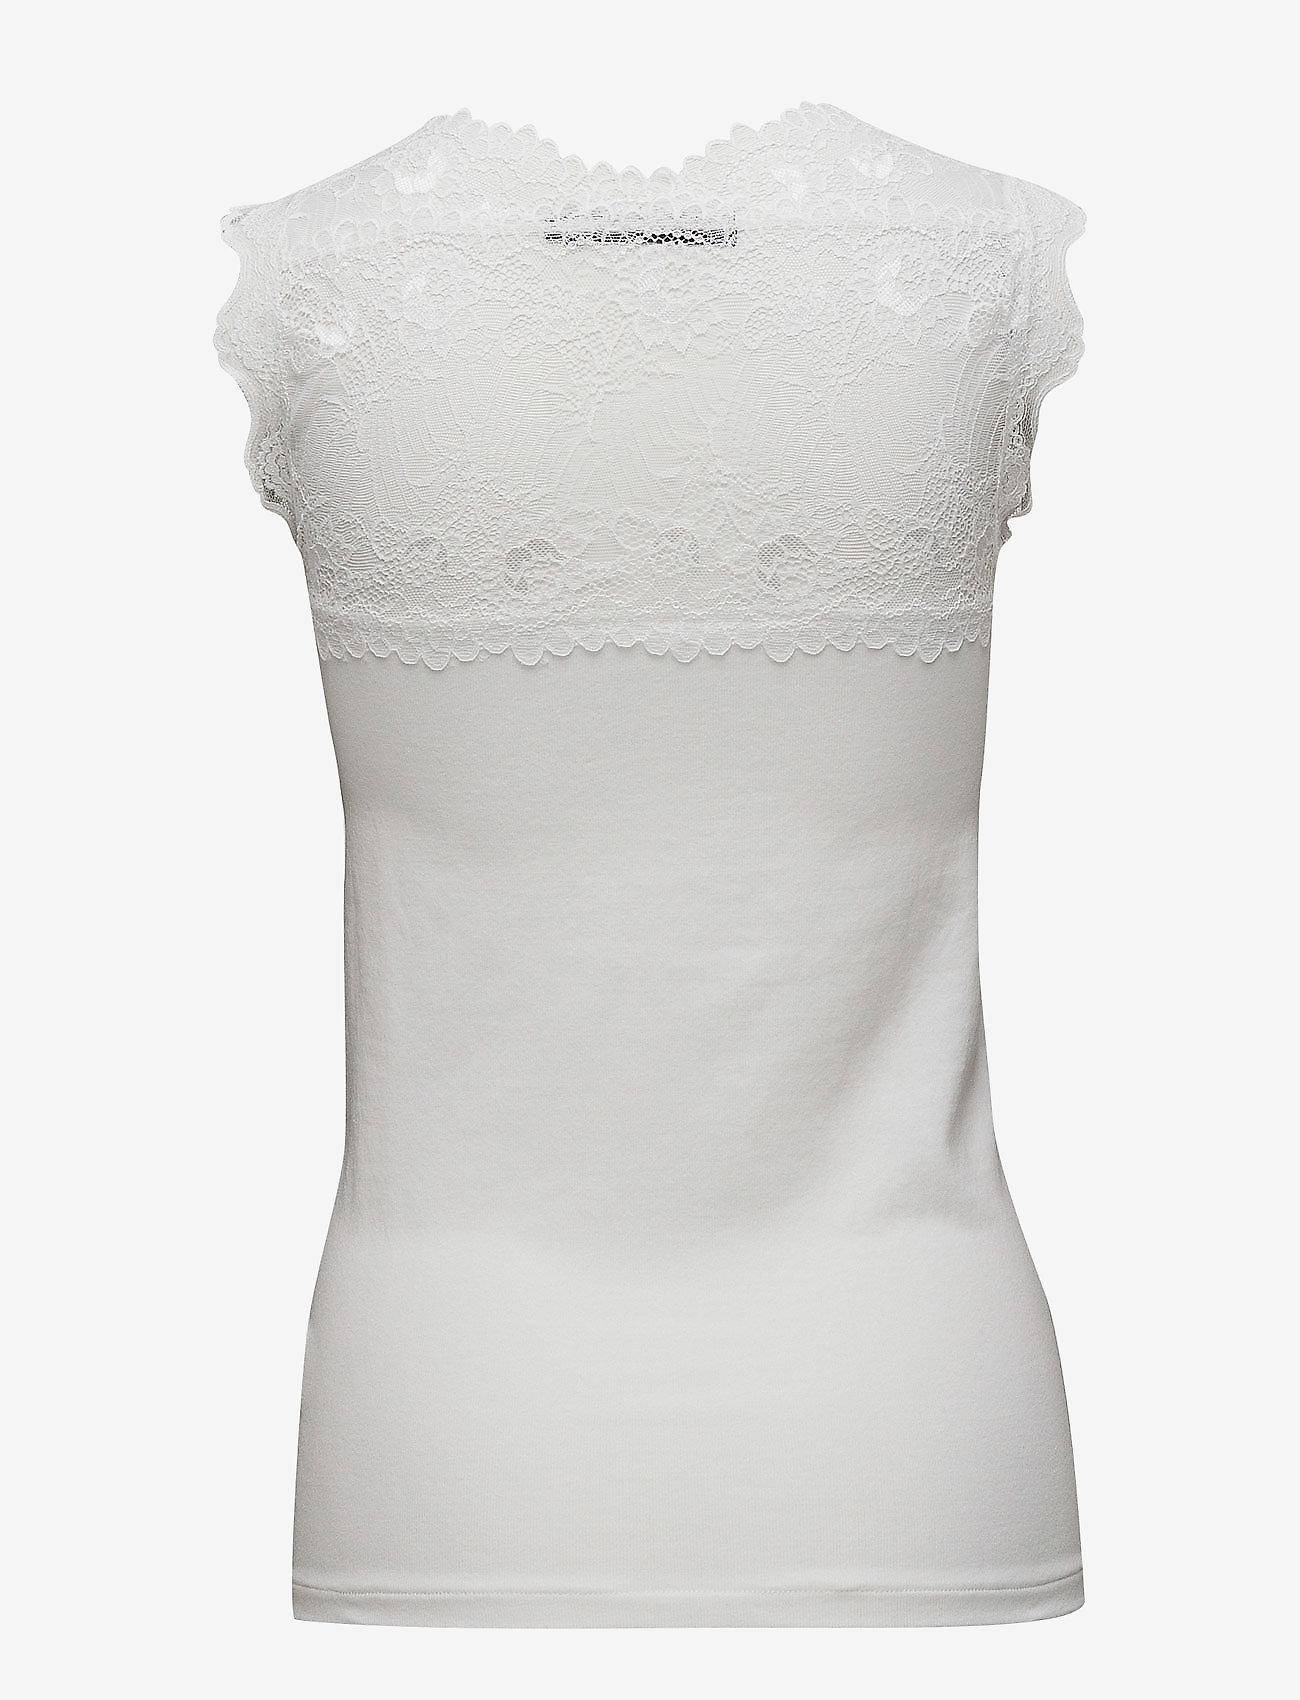 Minus - Vanessa top - topi bez piedurknēm - broken white - 1